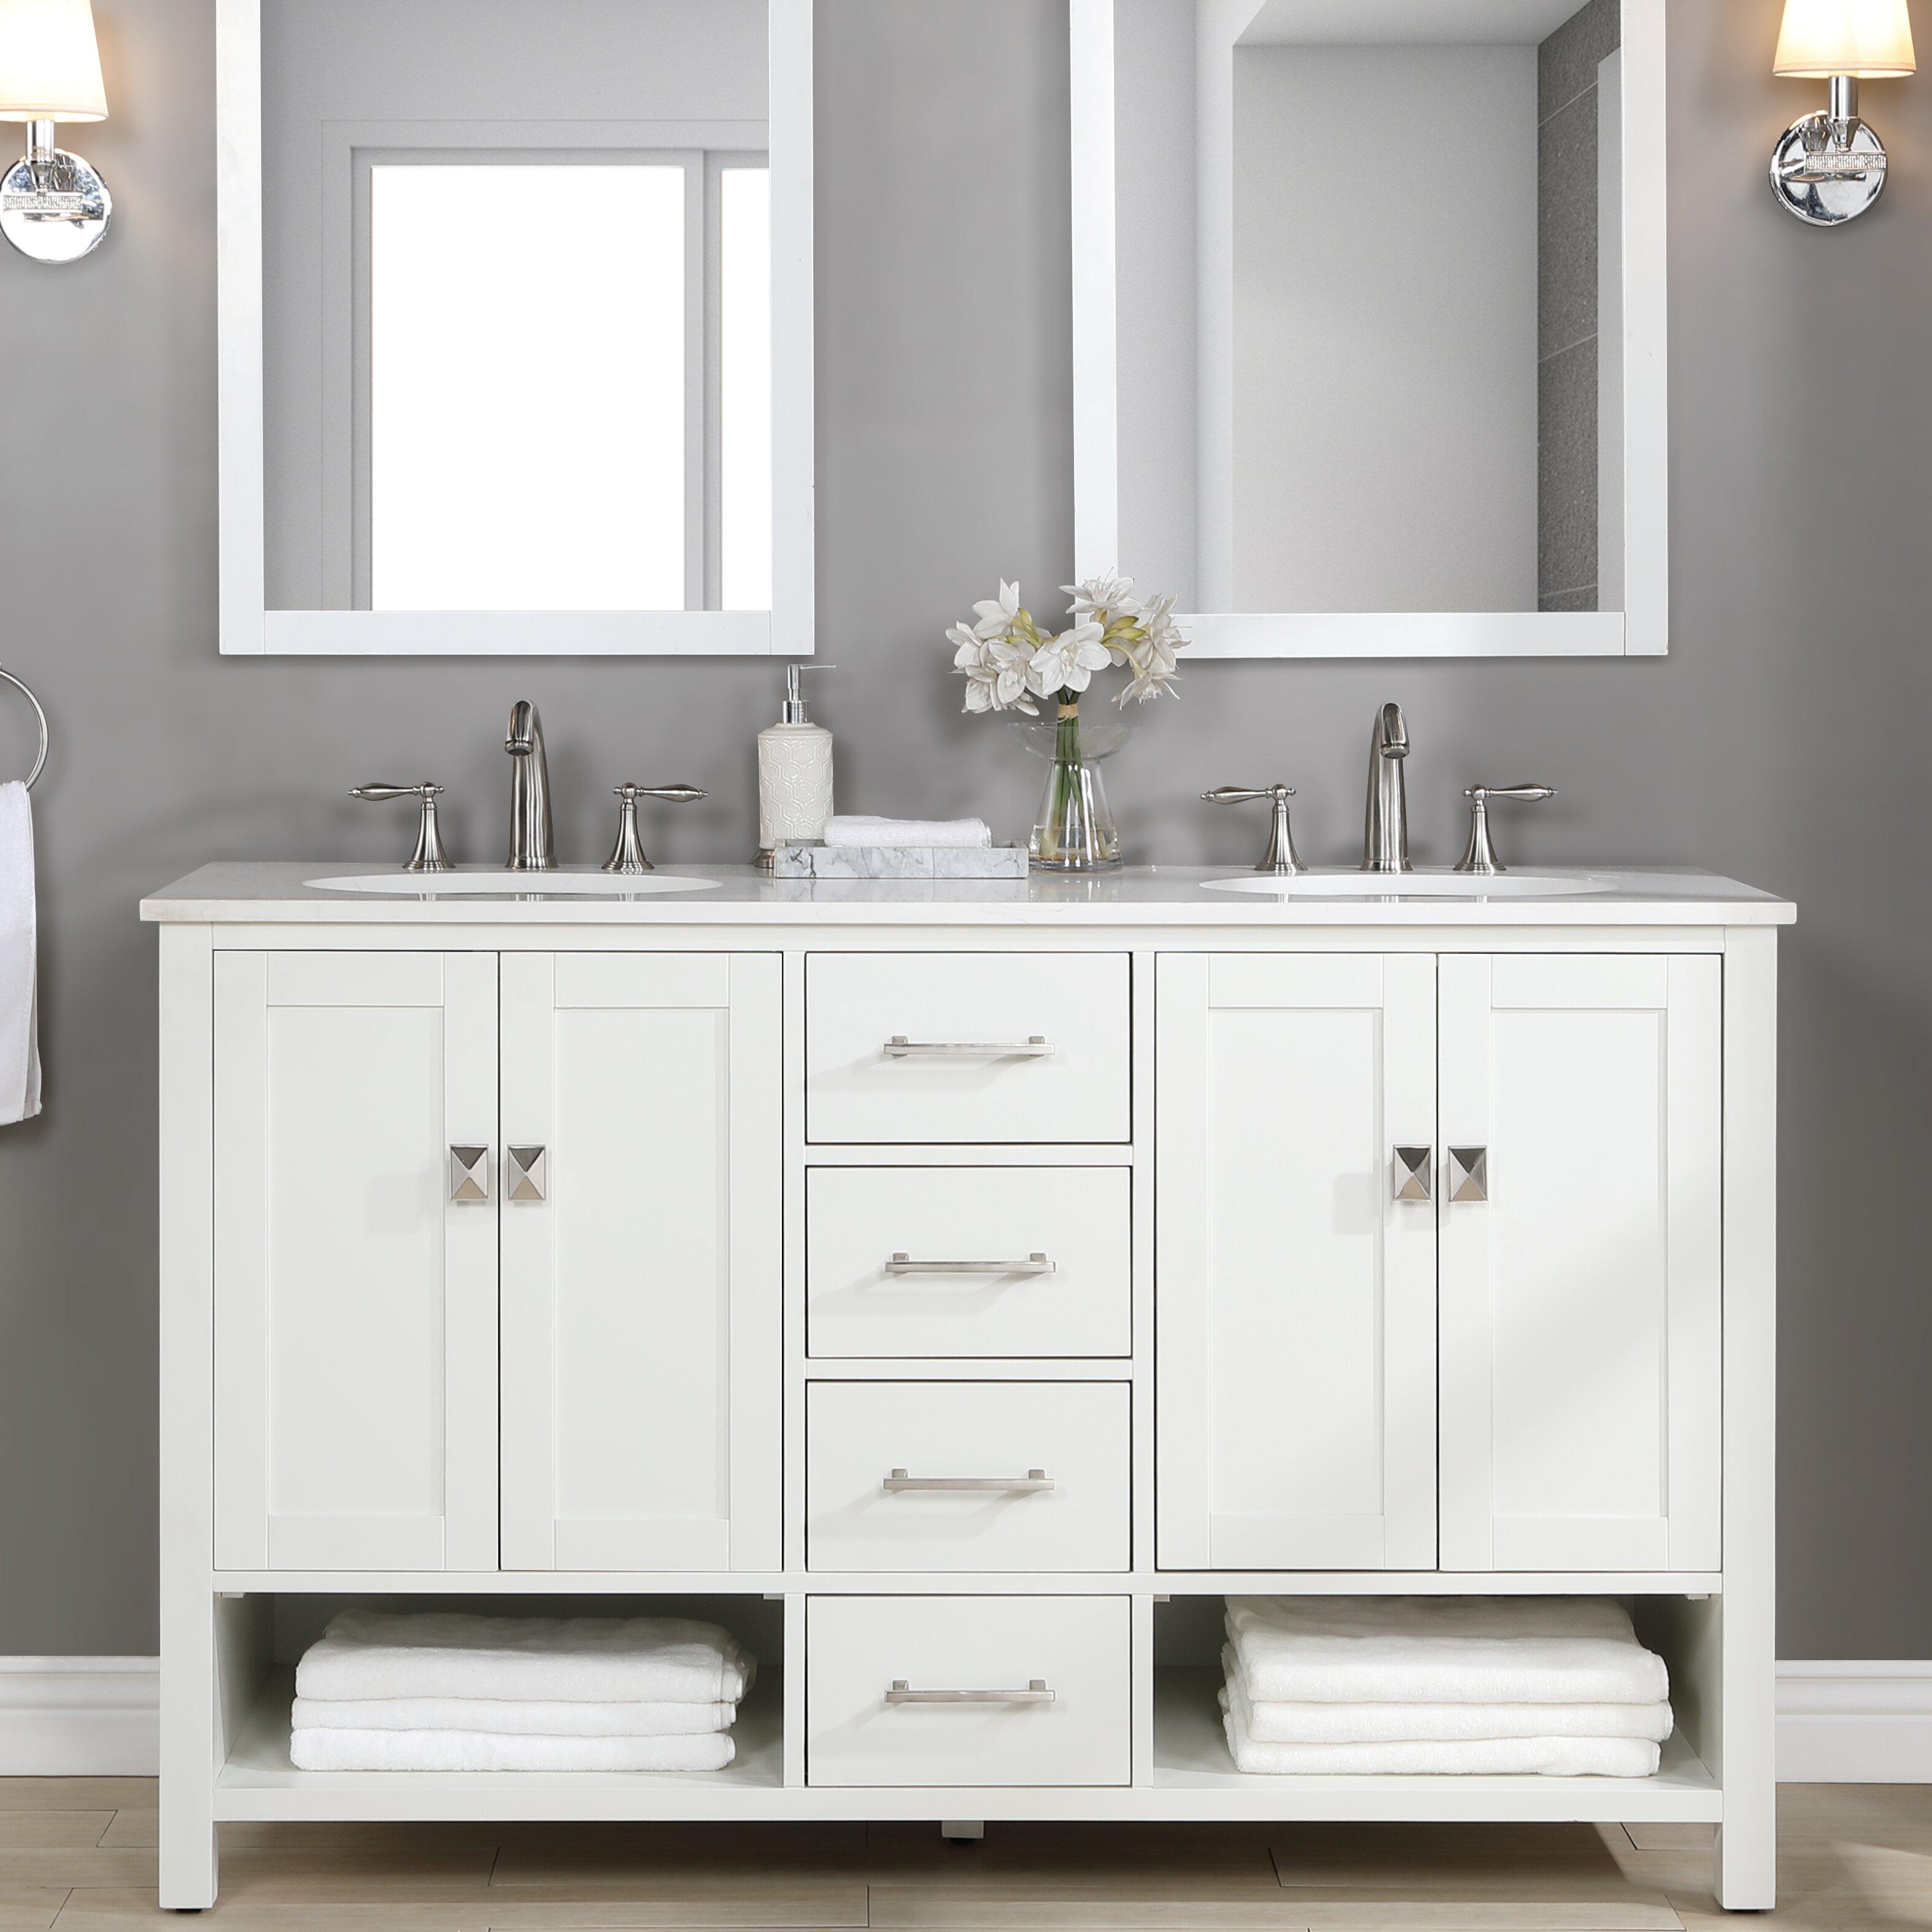 Latitude Run Iaria 60 Double Bathroom Vanity Reviews Wayfair